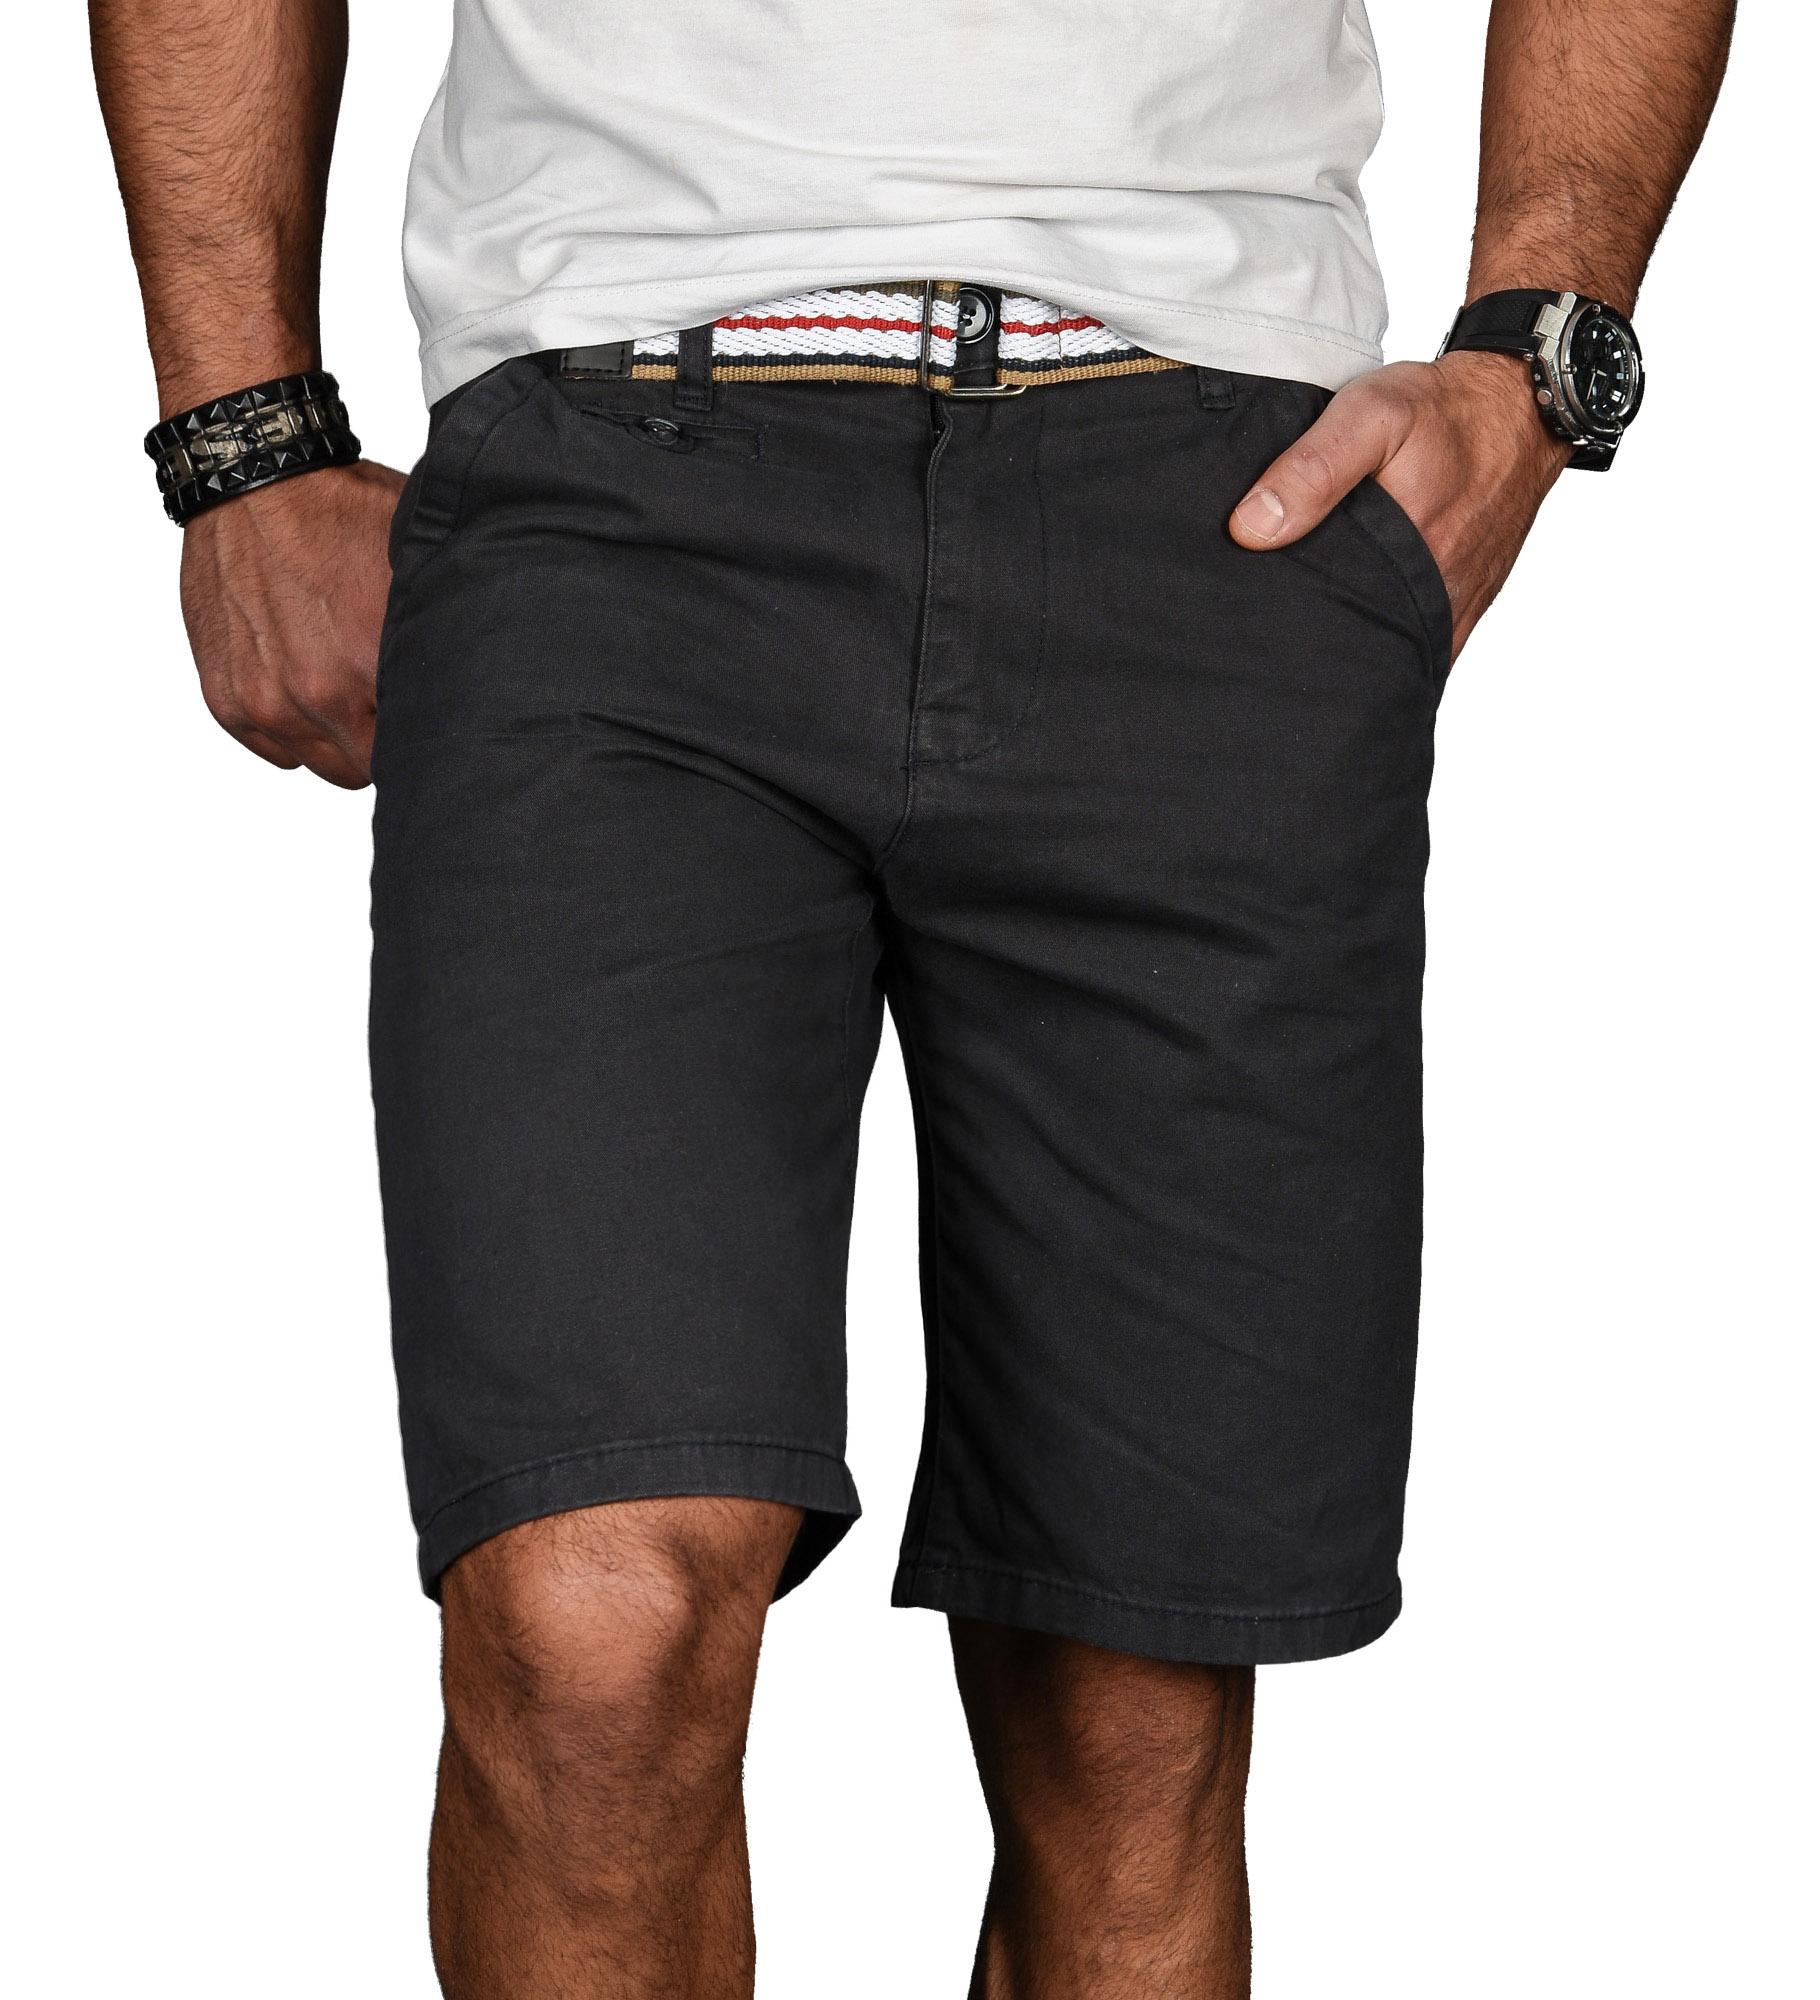 A-Salvarini-Herren-Shorts-kurze-Sommer-Hose-mit-Guertel-Short-Bermuda-NEU-AS096 Indexbild 16